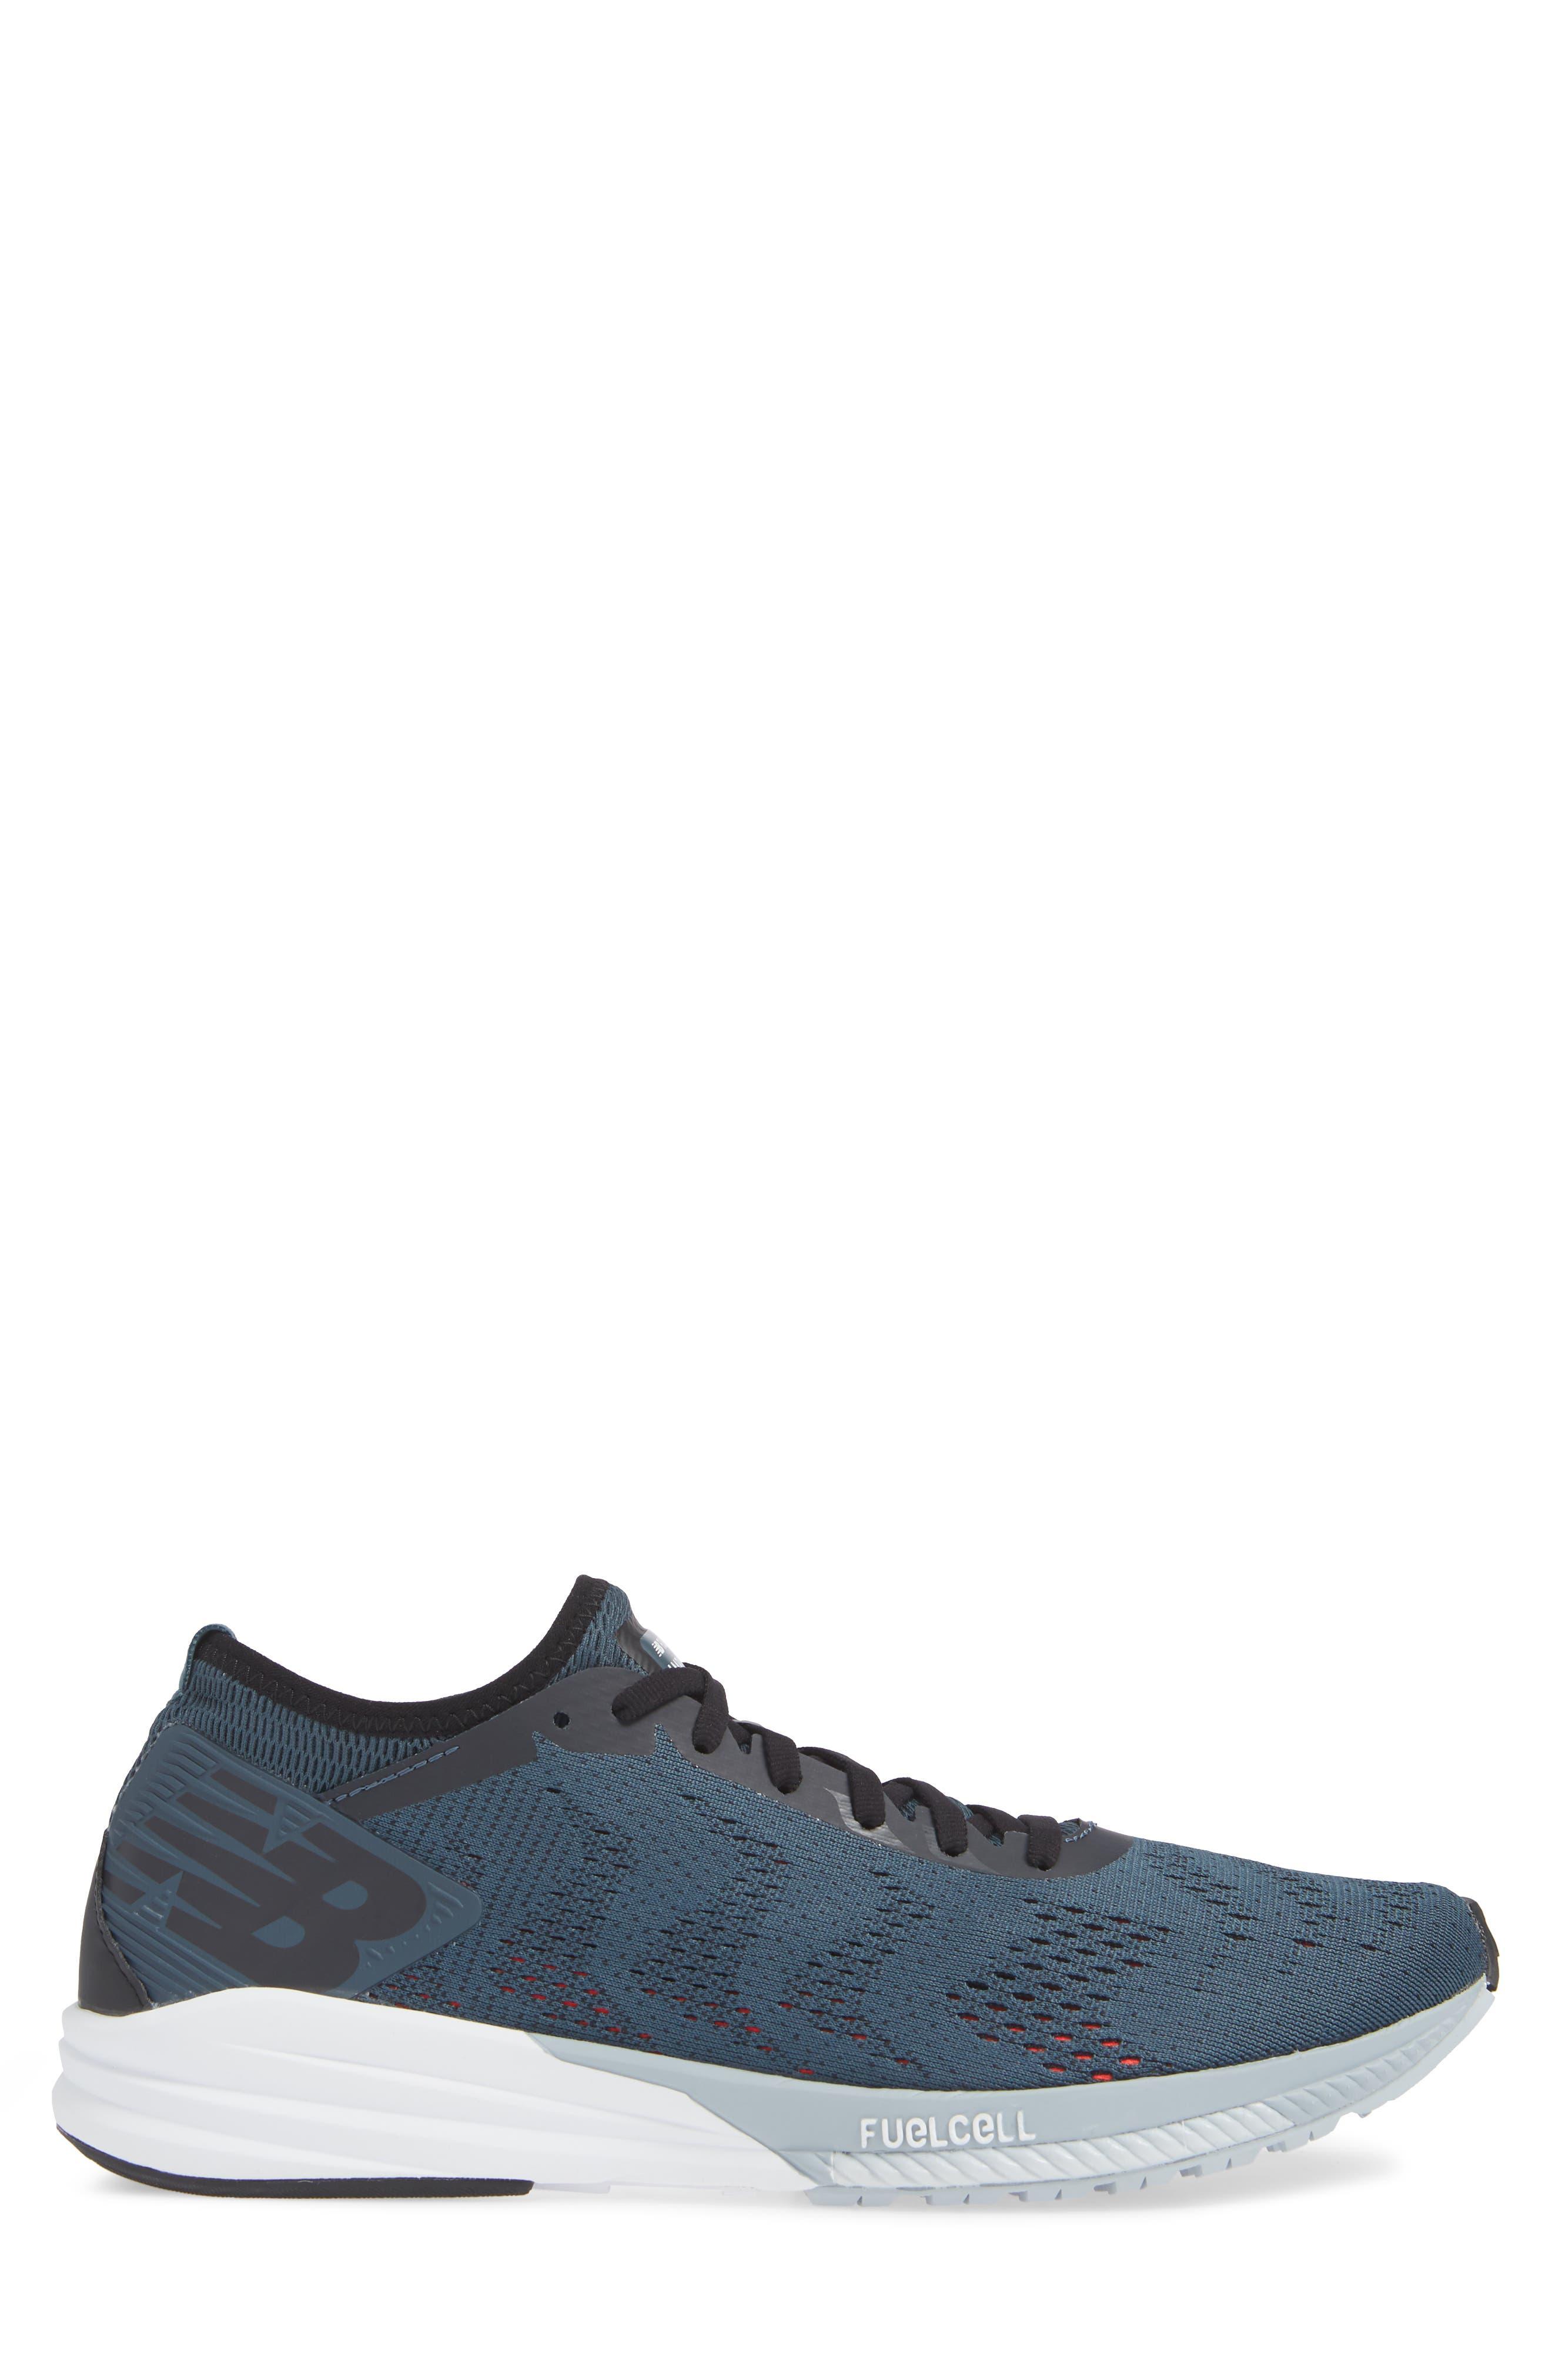 FuelCell Impulse Running Shoe,                             Alternate thumbnail 3, color,                             PETROL